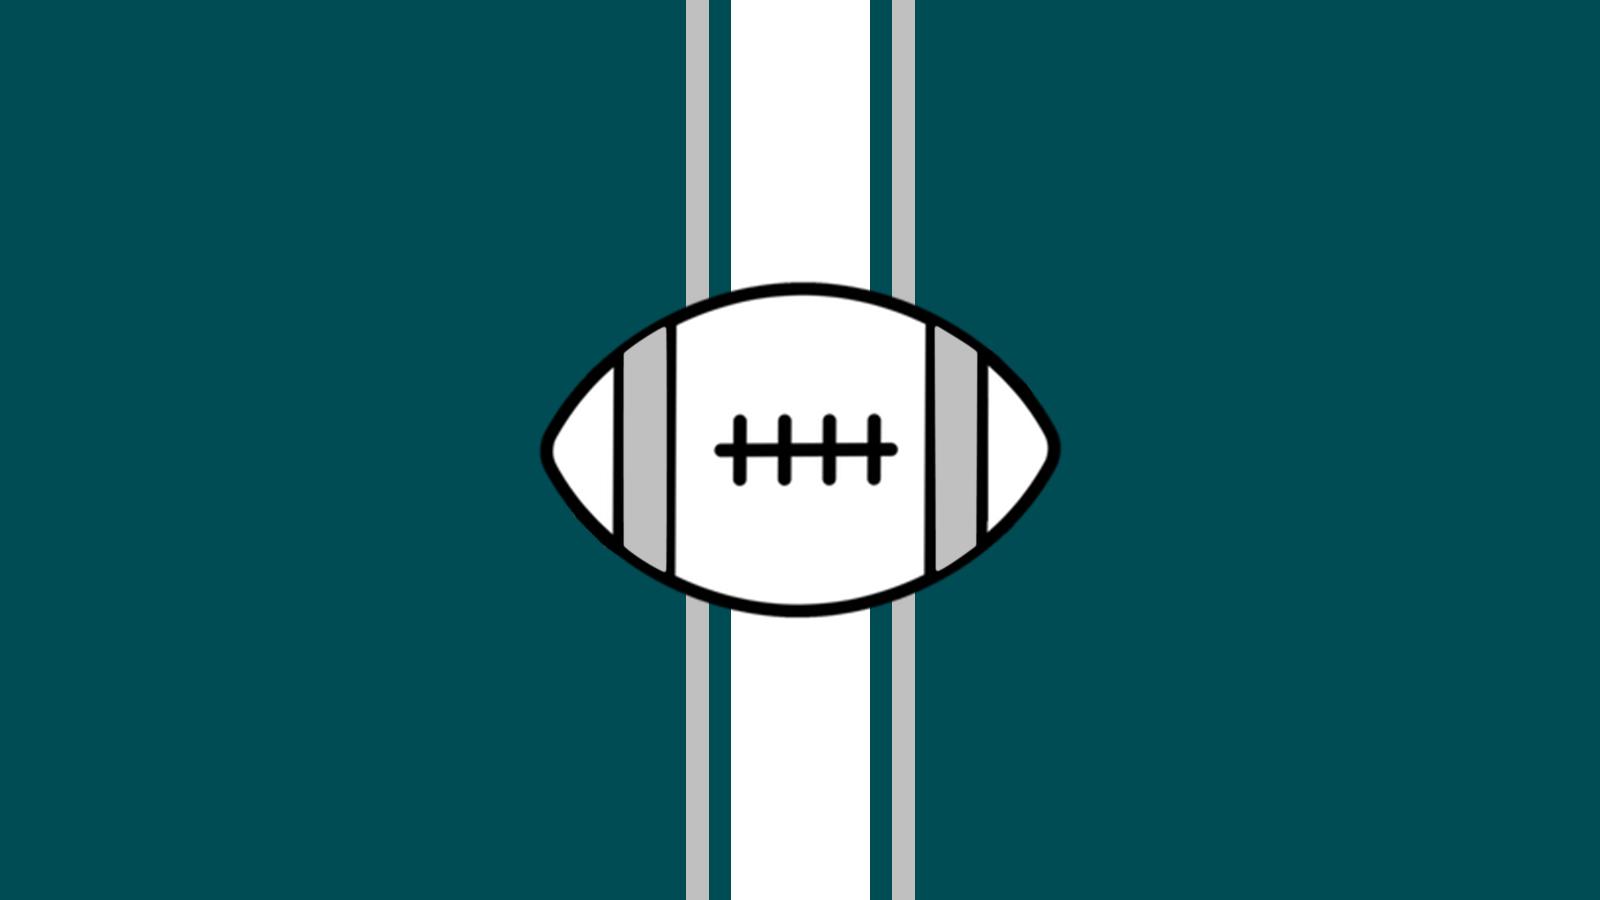 Philadelphia Eagles Playoff Tickets